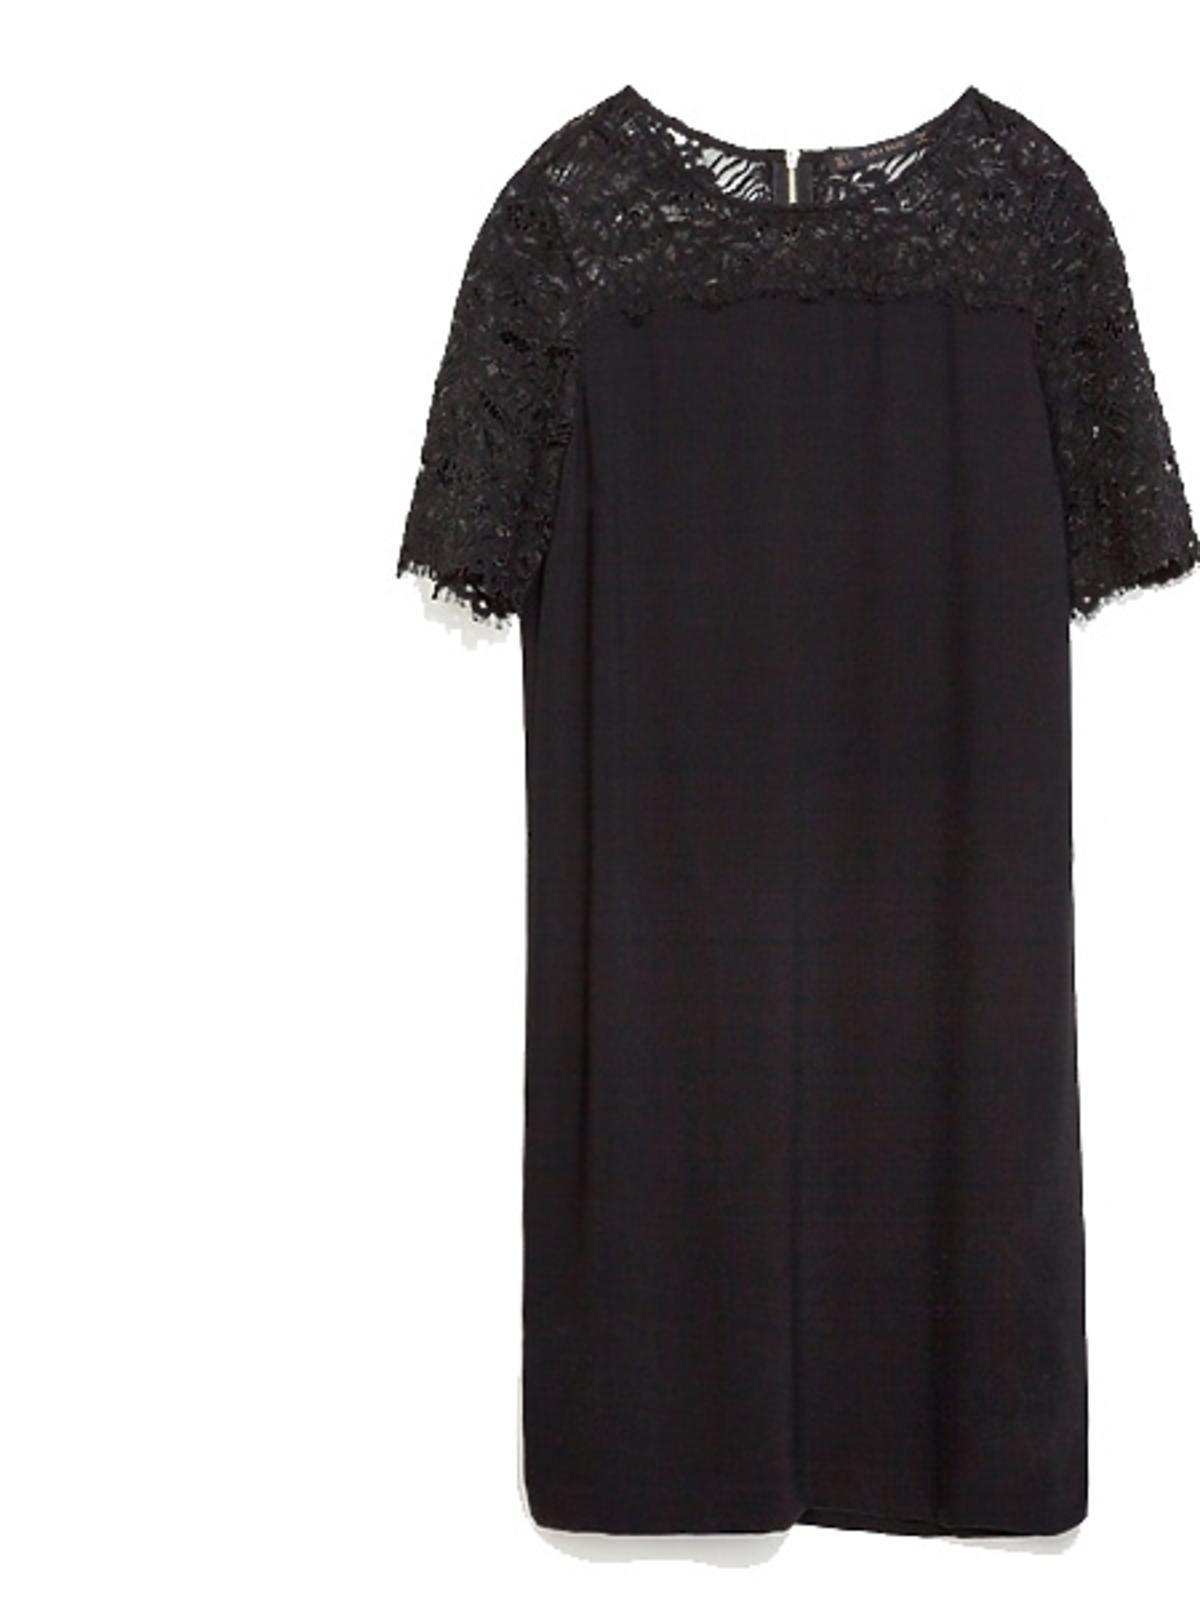 Czarna sukienka Zara, cena